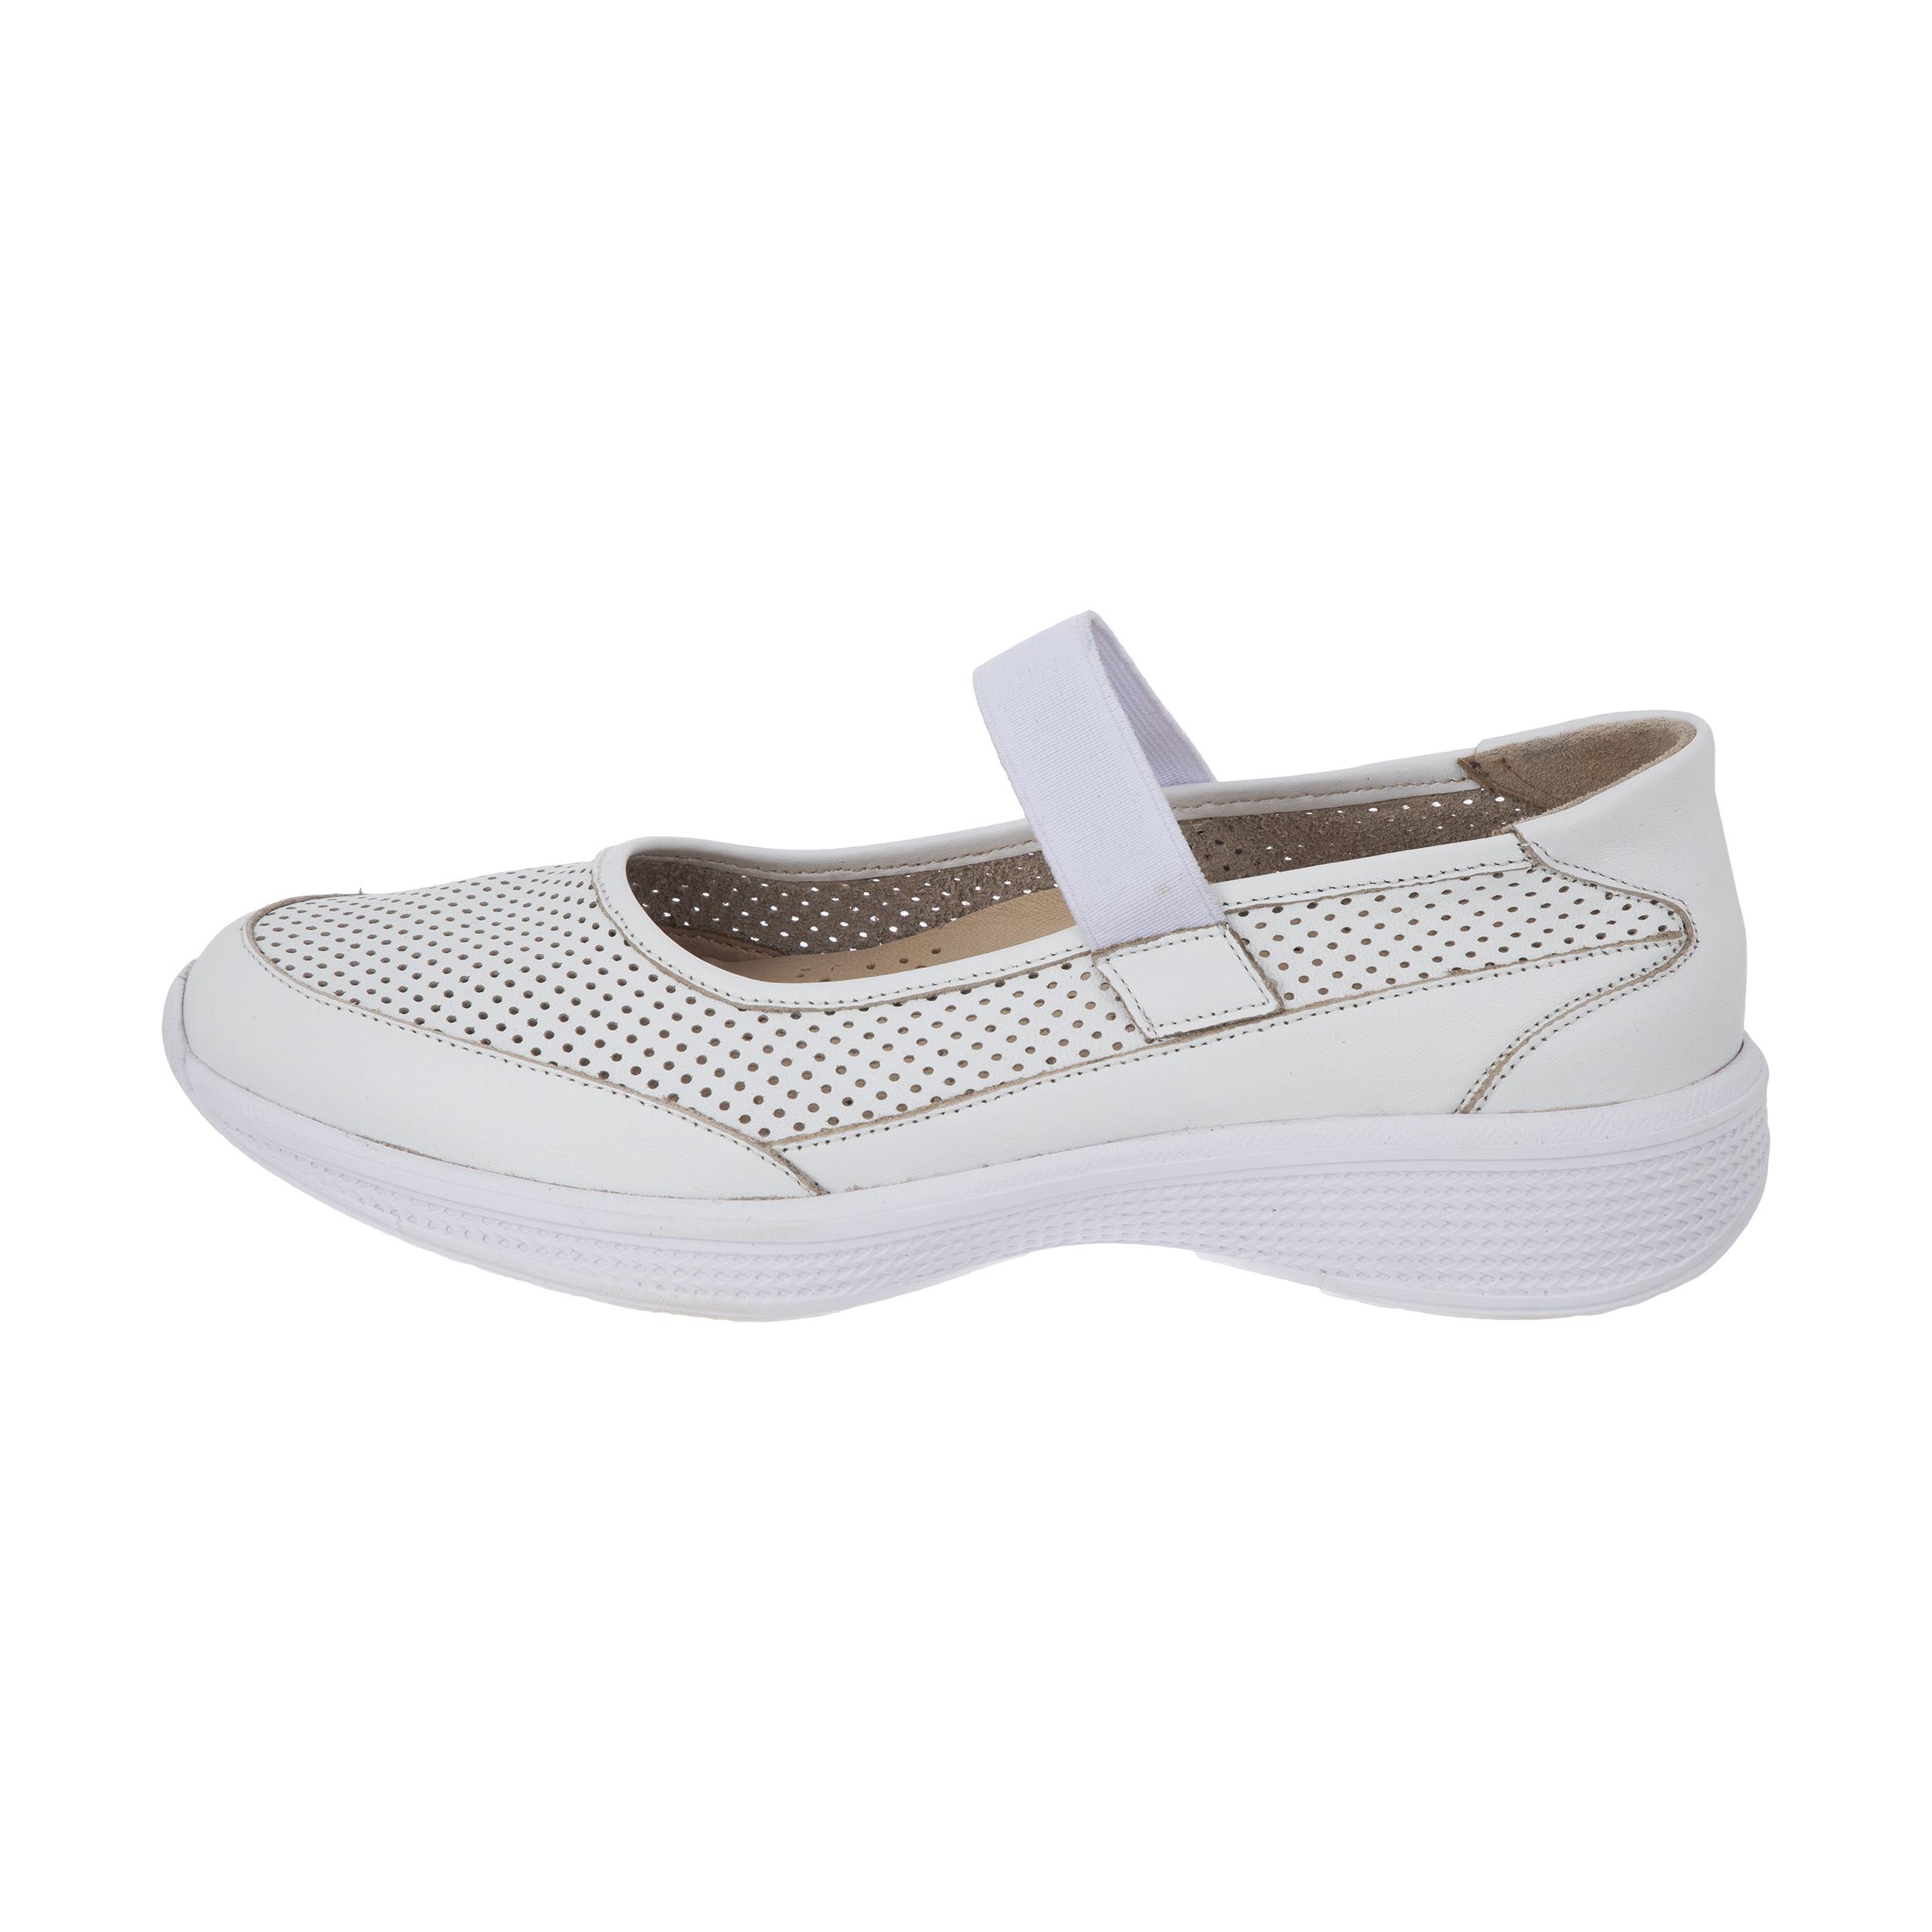 کفش روزمره زنانه برتونیکس مدل 700-044